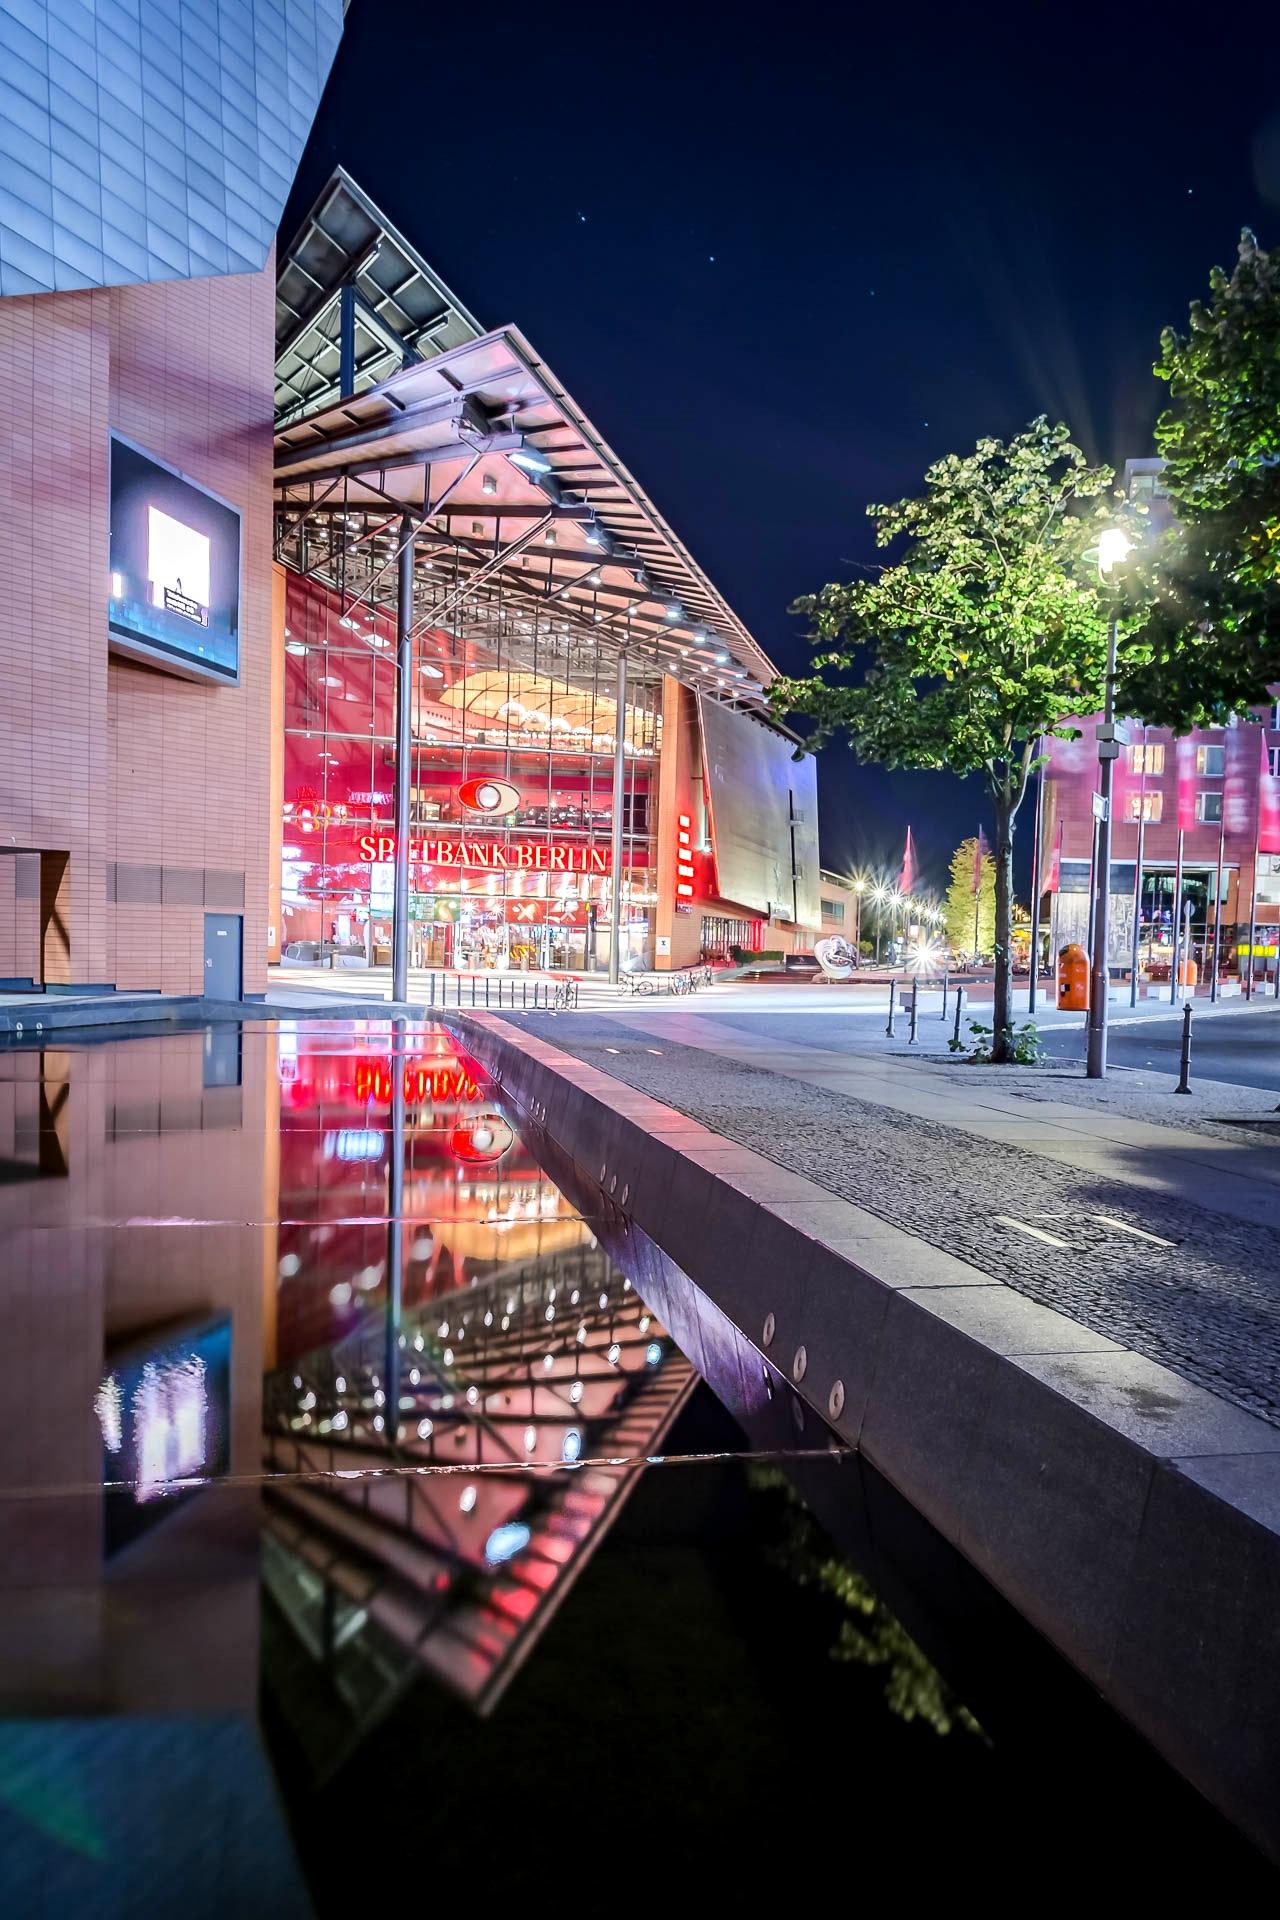 Spielbank Berlin by JeckstadtPhotography